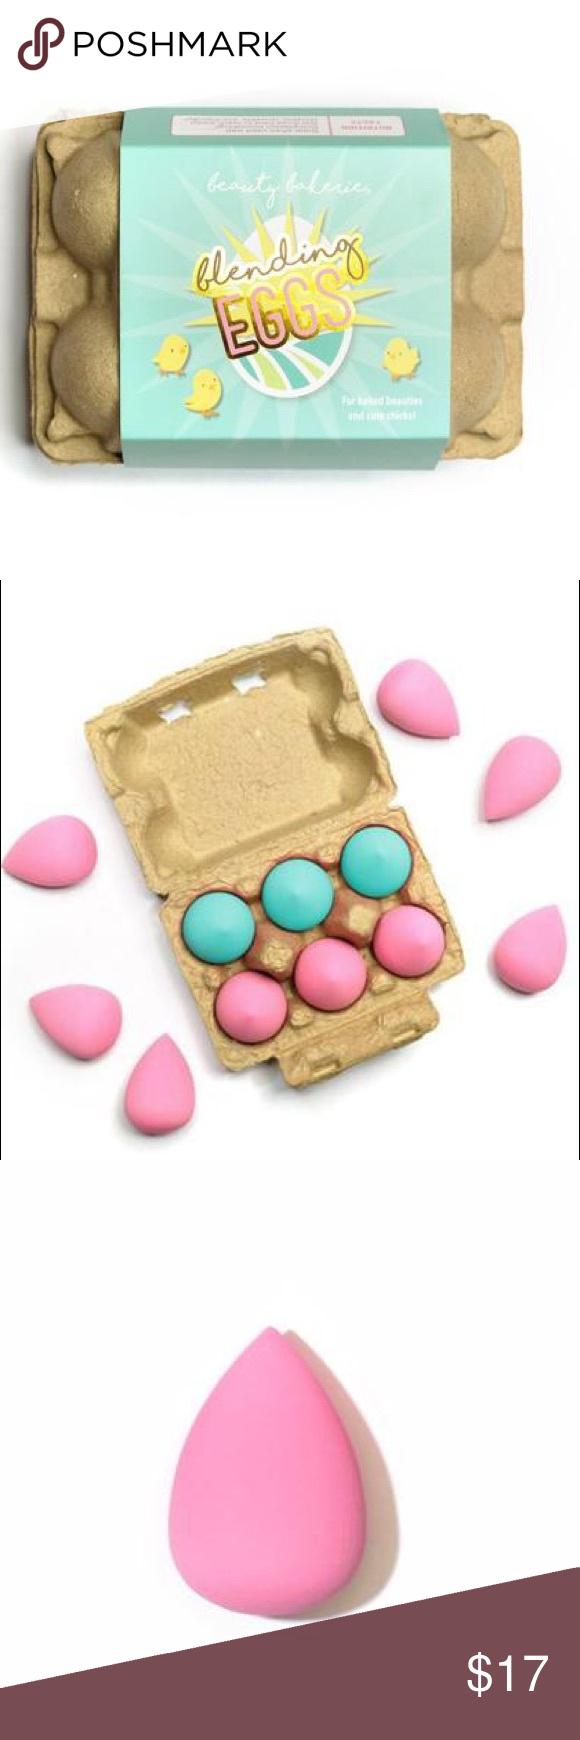 Beauty Bakerie Blending Eggs Beauty Sponges NWT Beauty